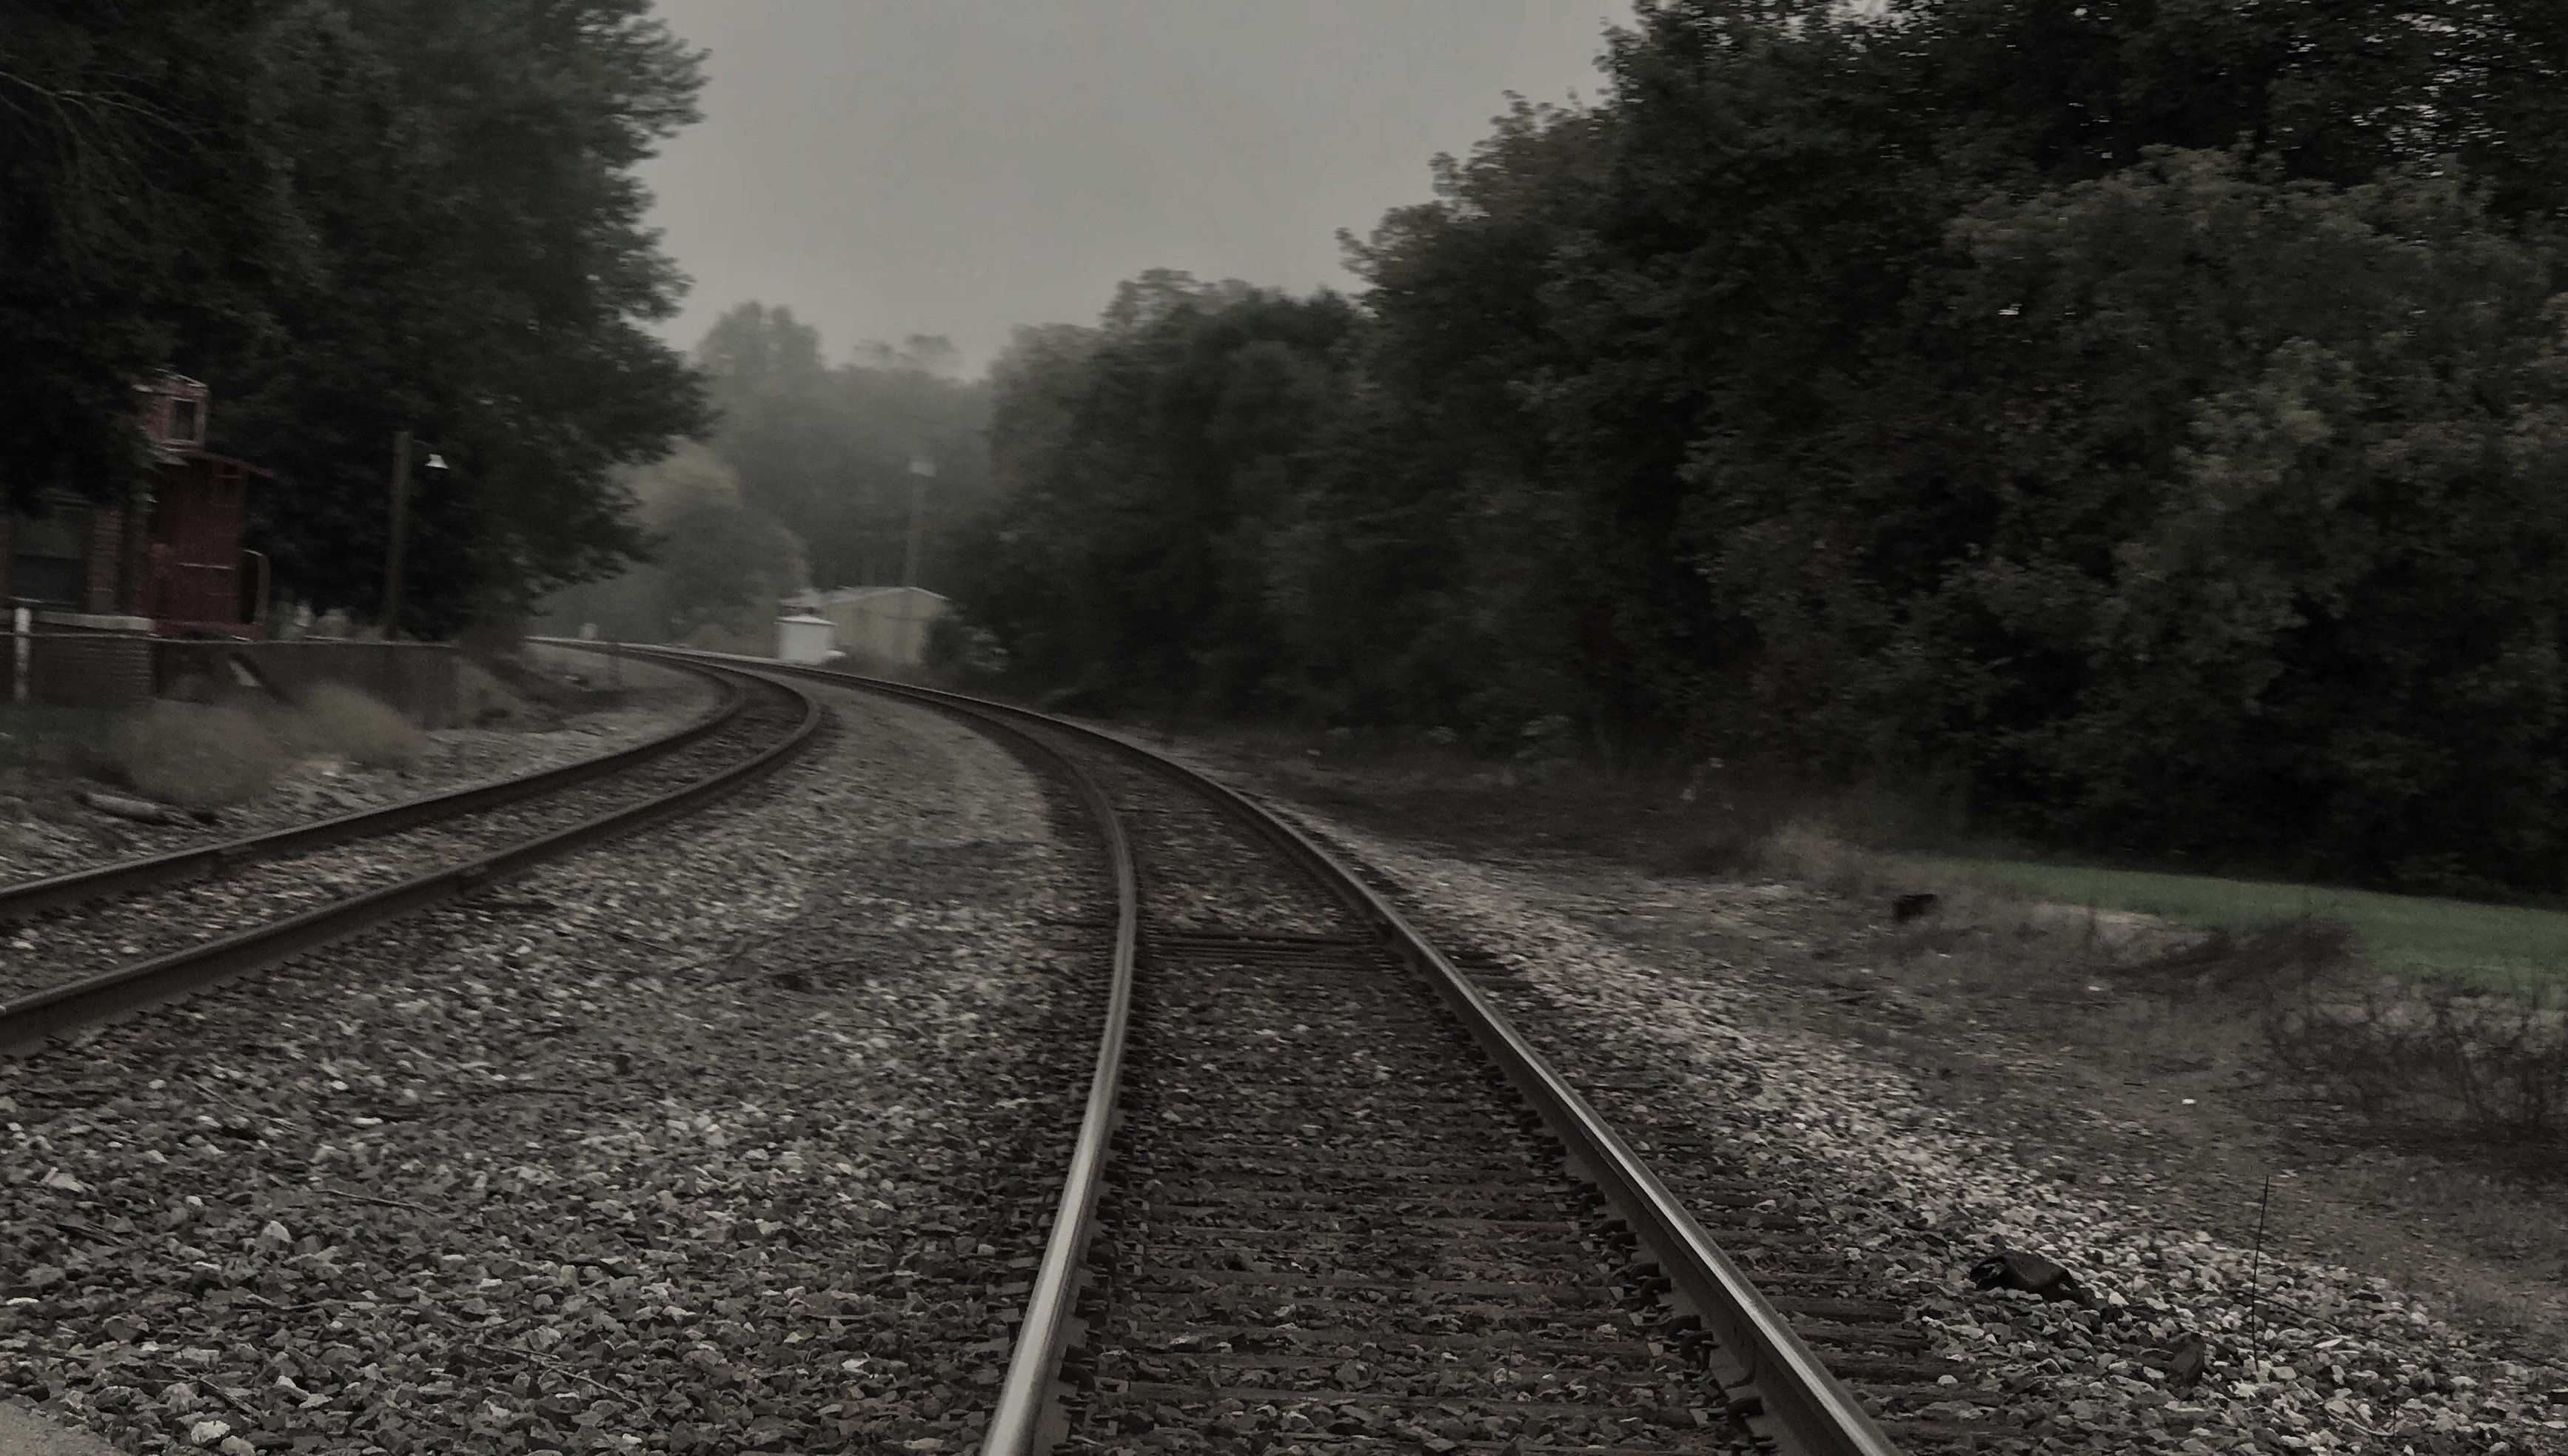 Jason D. Ramsey - Photography